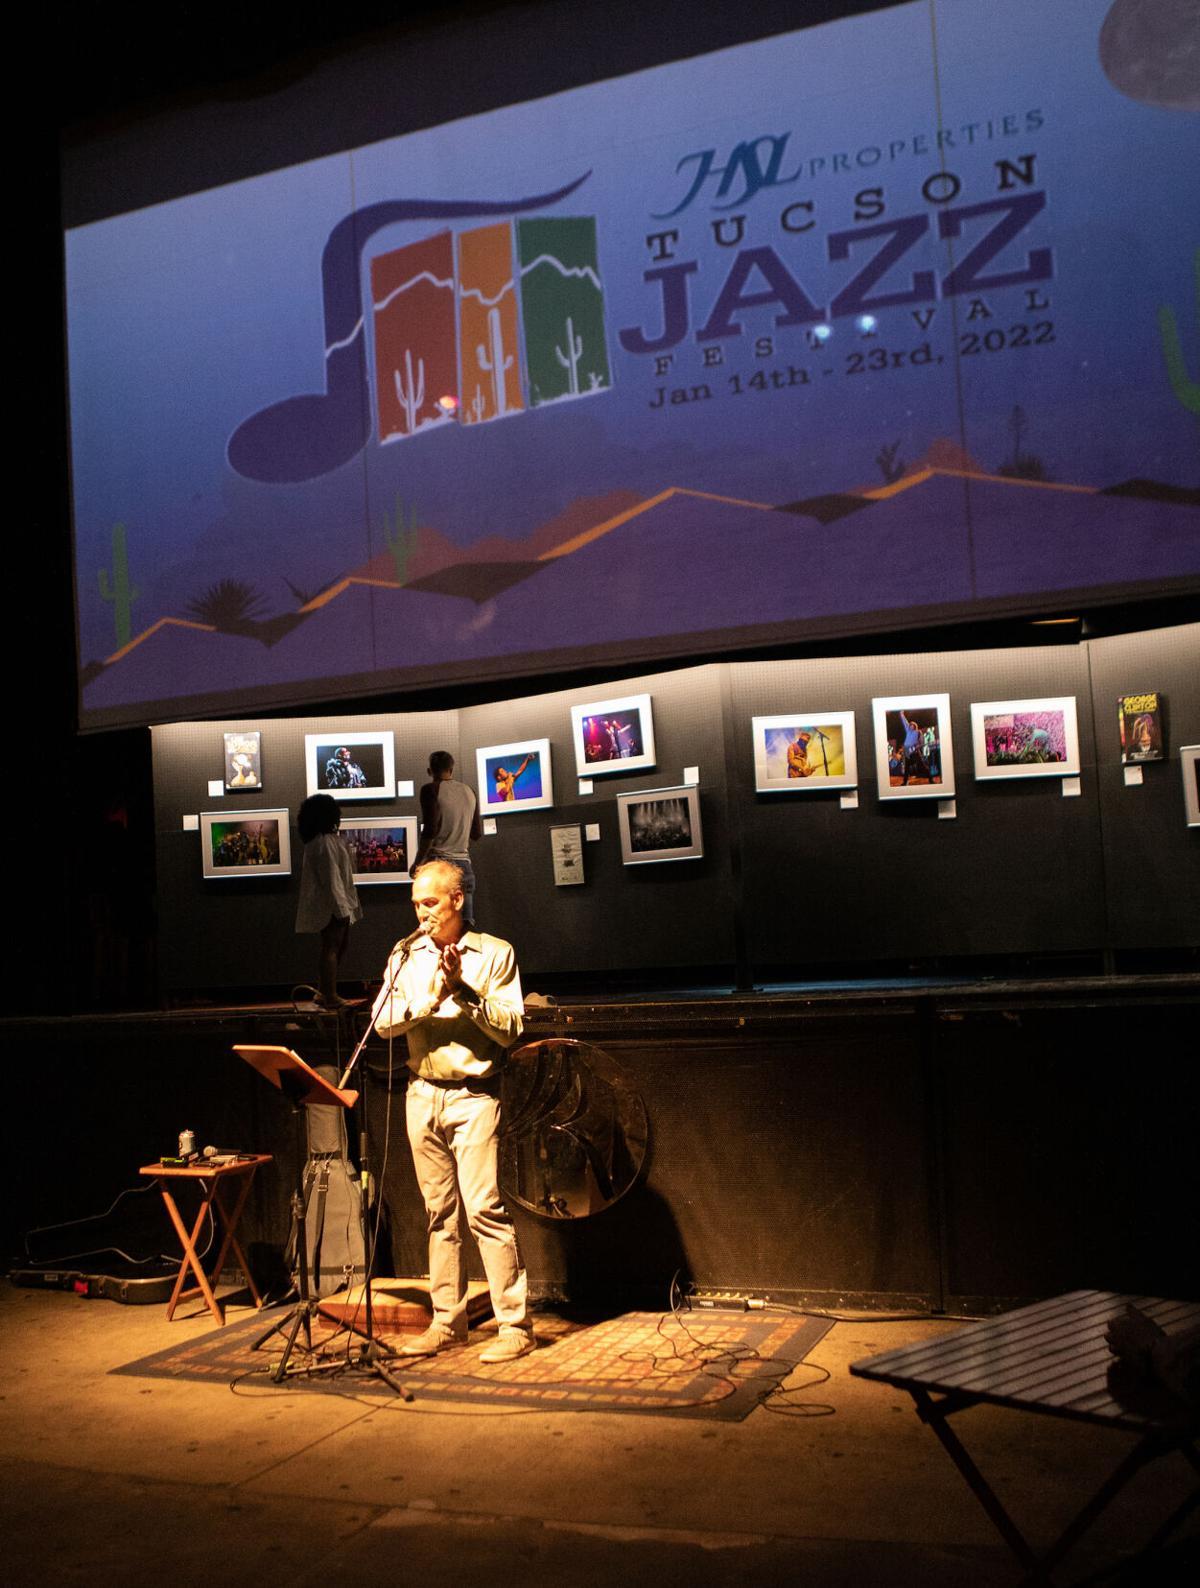 Tucson Jazz Festival is on